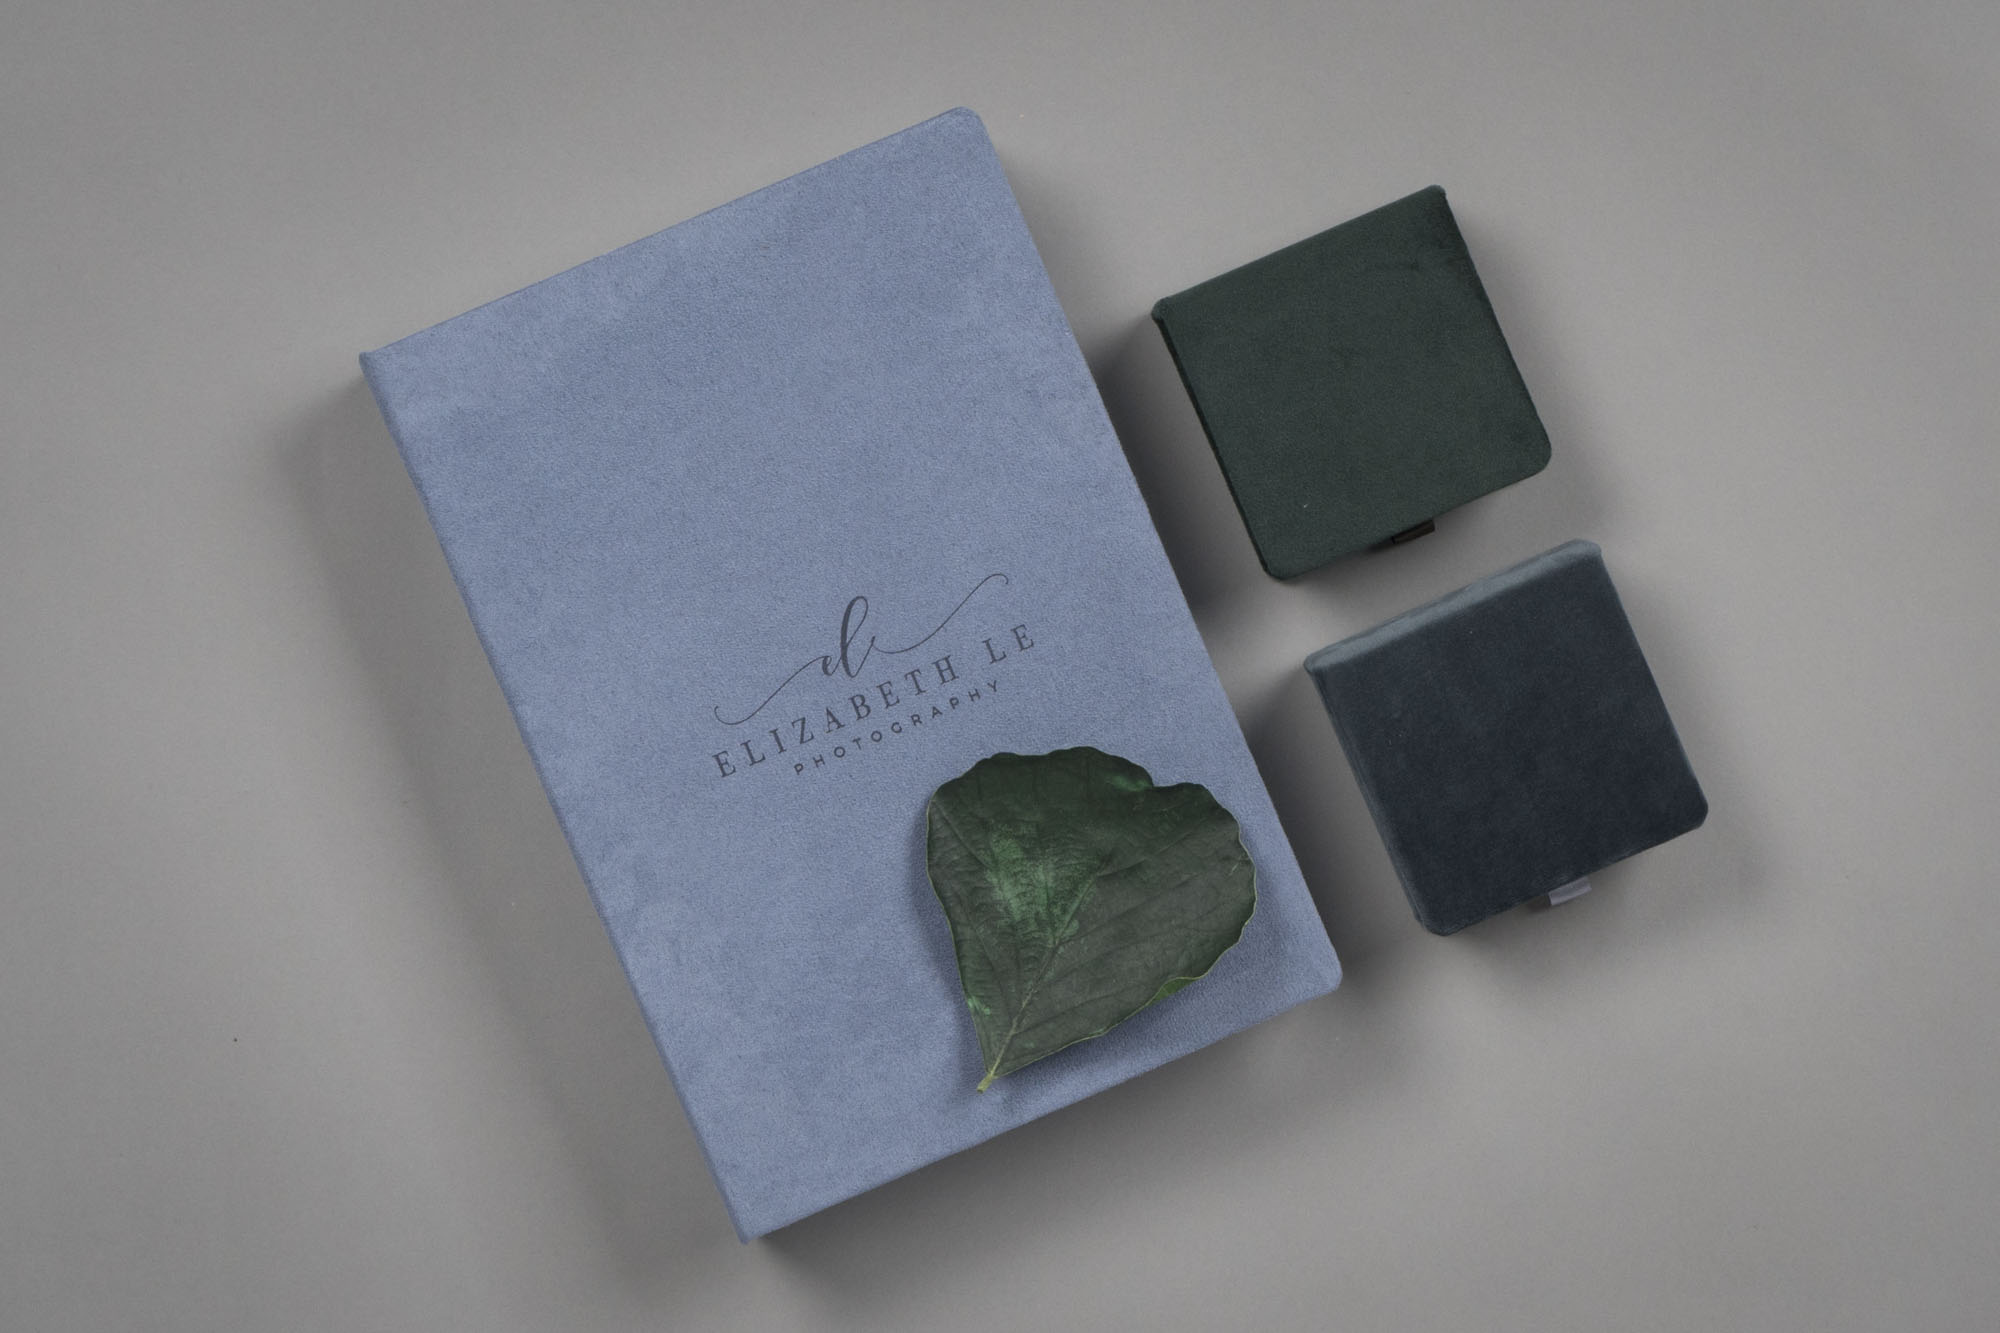 Velvet Folio Box and USBs